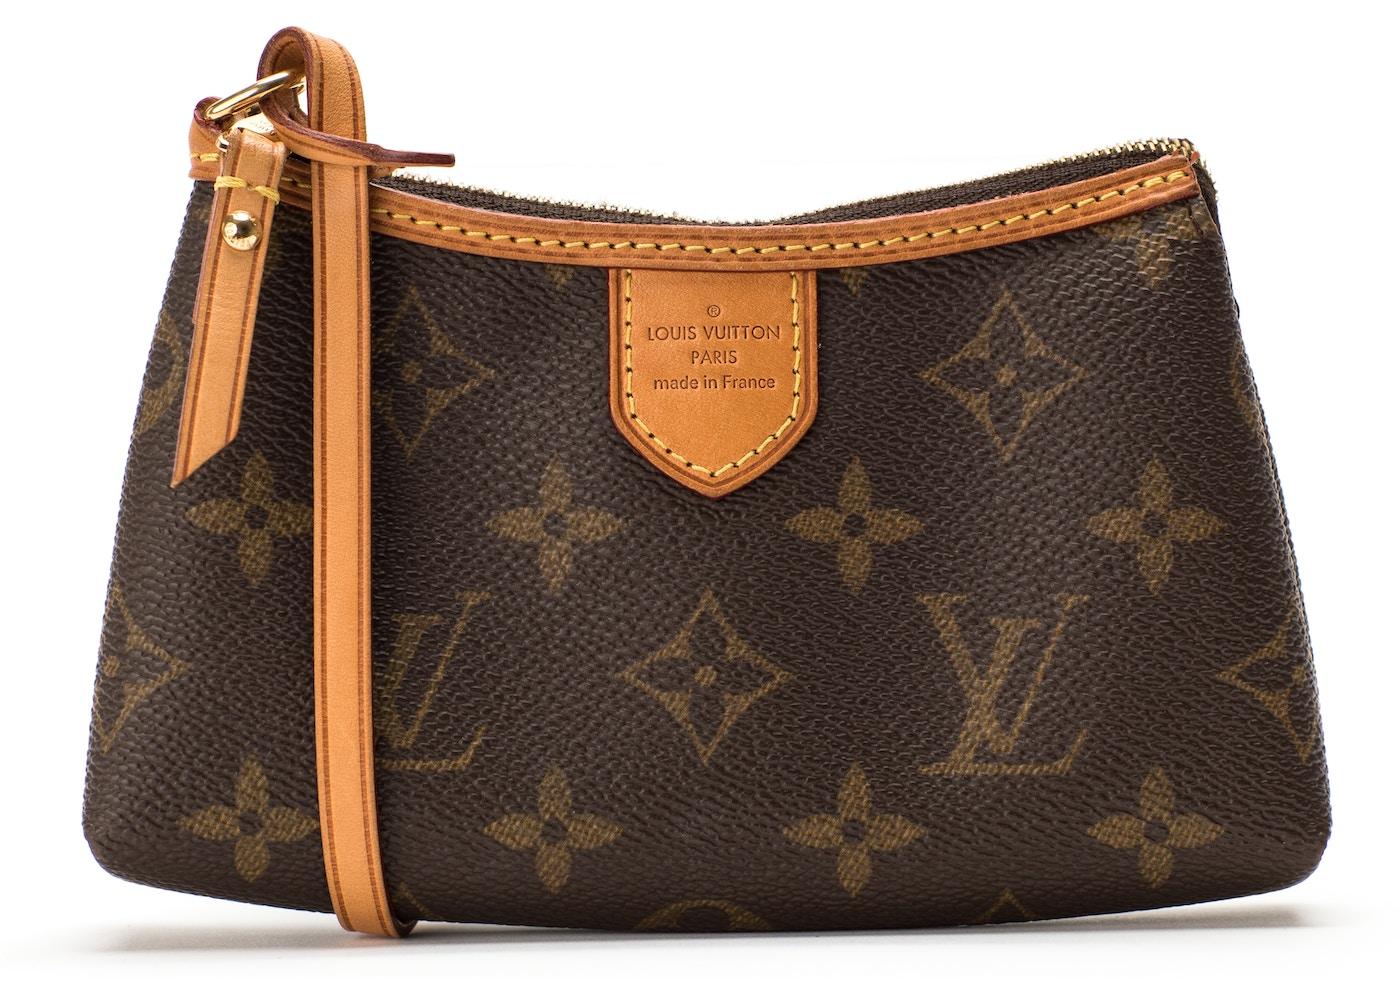 89c5d63fc97b Buy   Sell Louis Vuitton Other Handbags - Price Premium